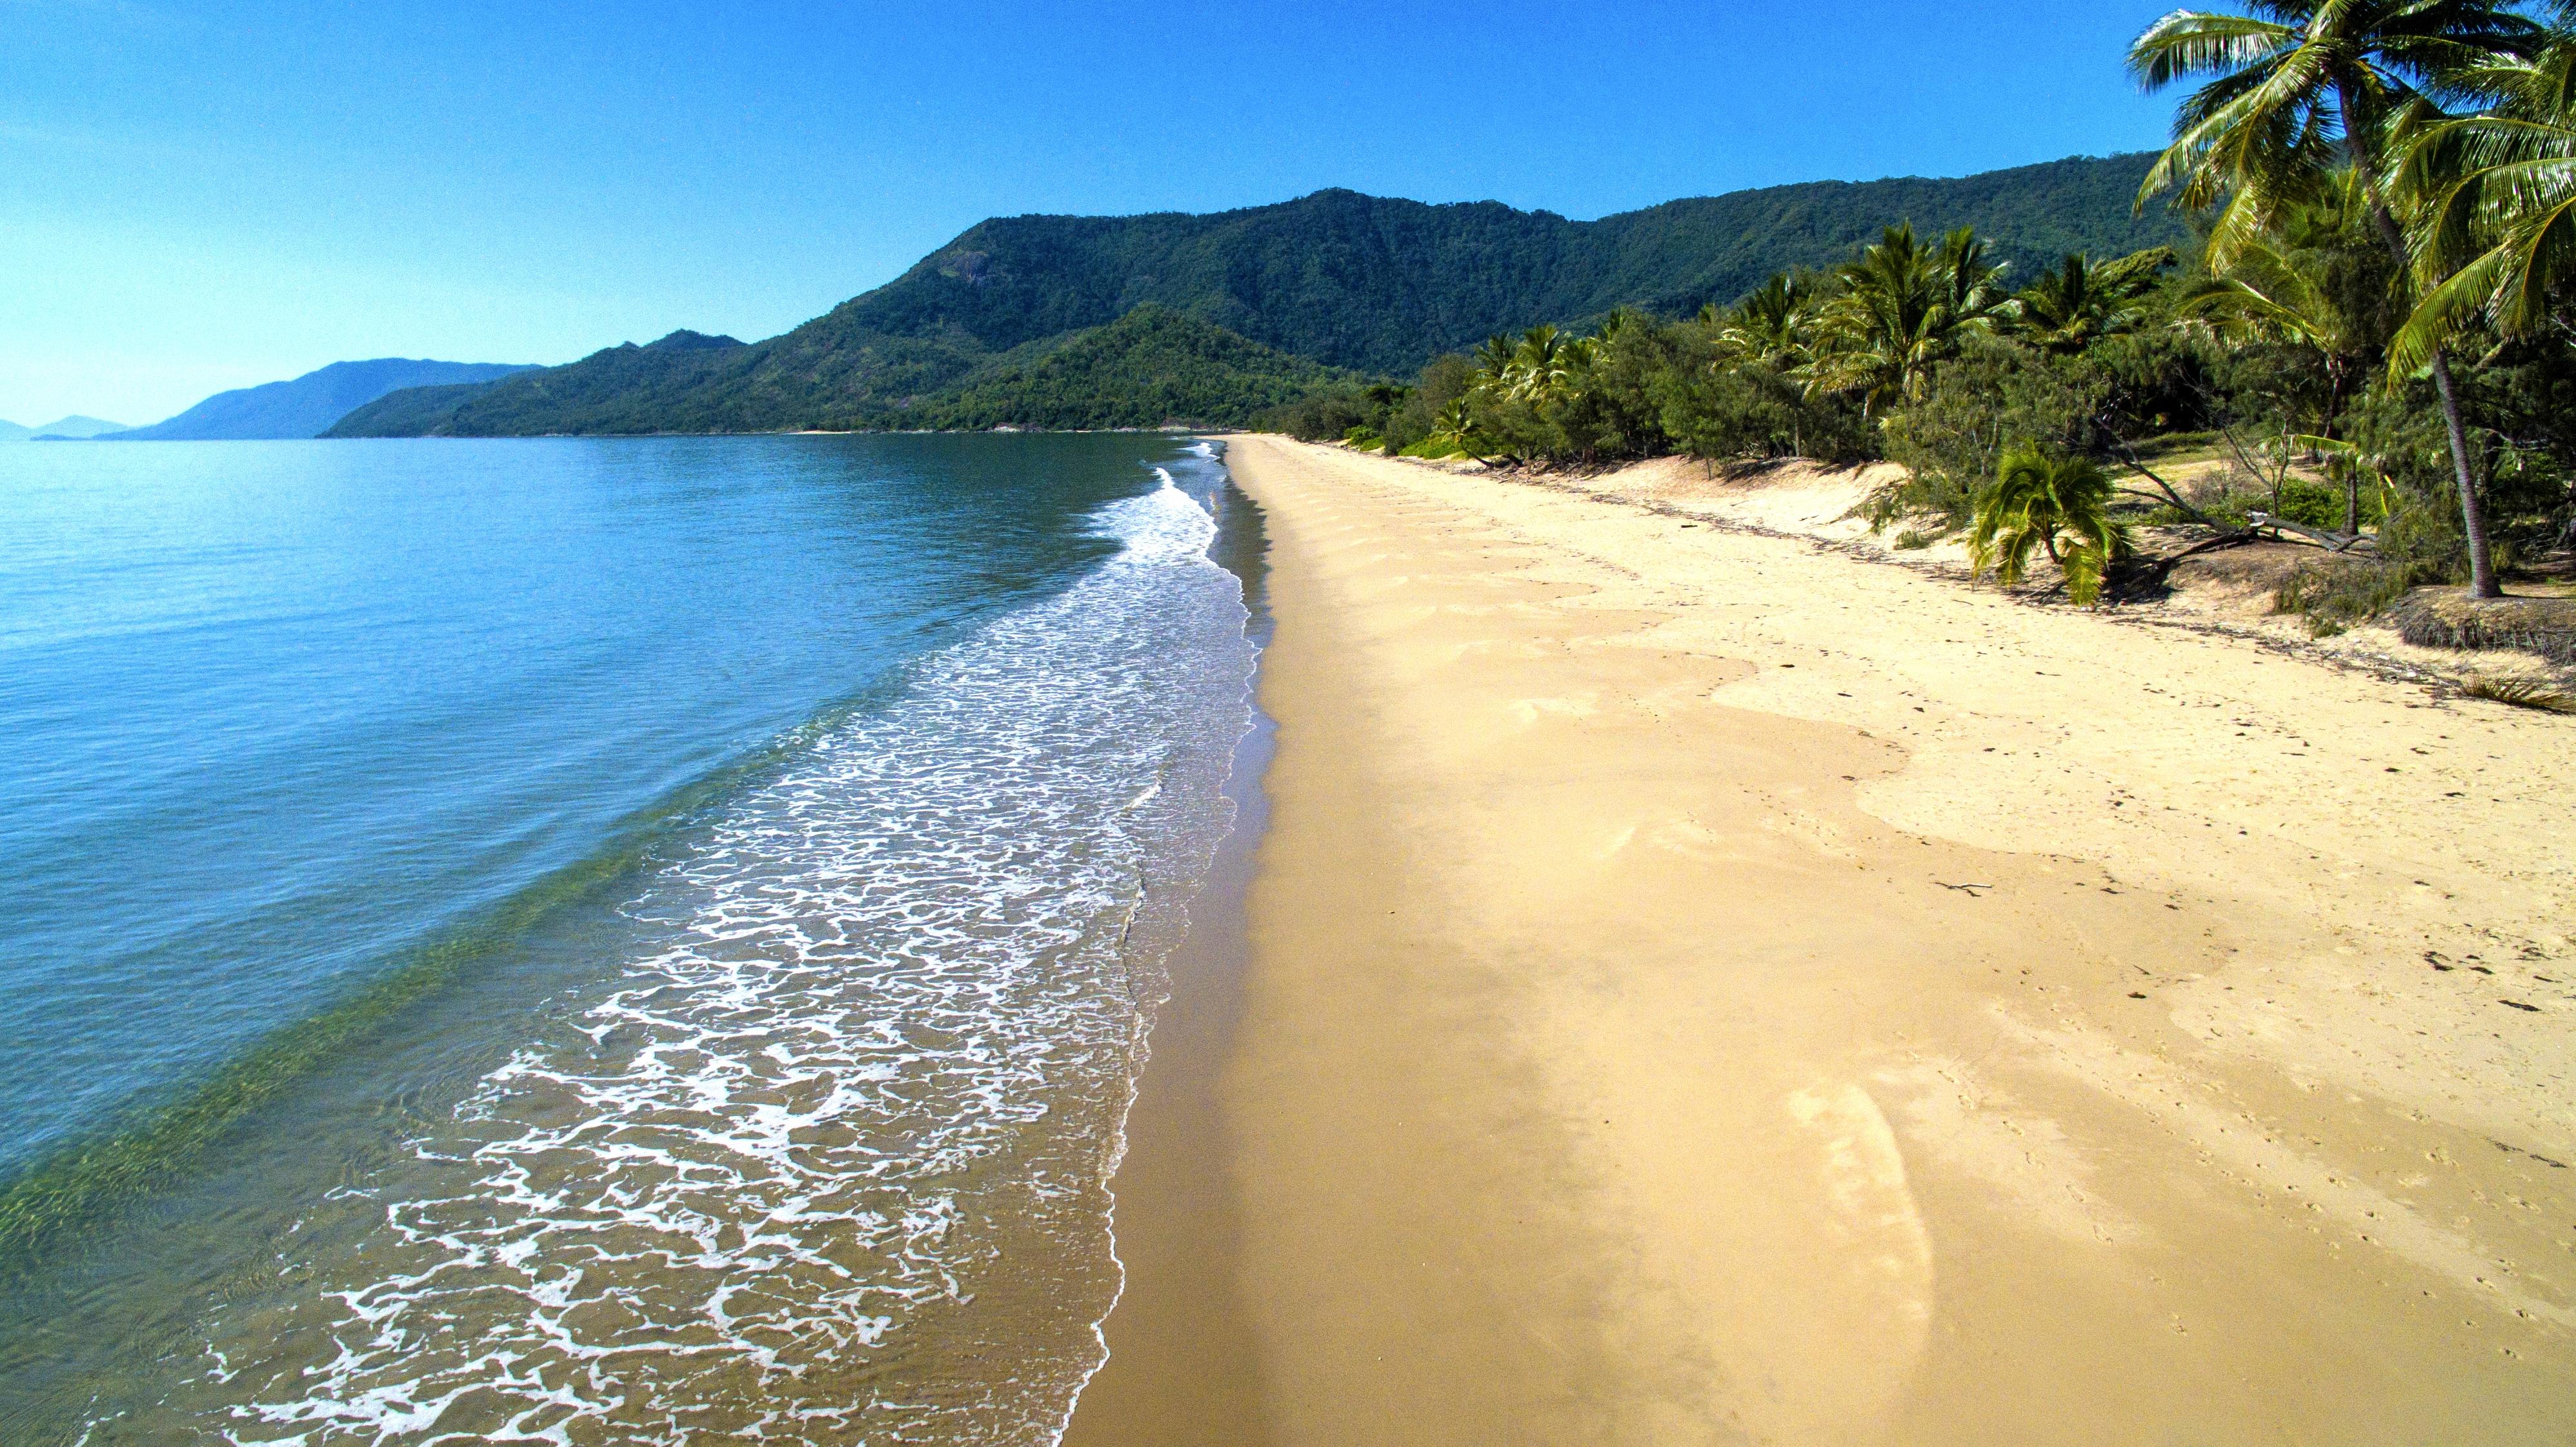 https://www.thalabeach.com.au/wp-content/uploads/2010/07/Thala_Beach_Nature_Reserve_2016__179.jpg